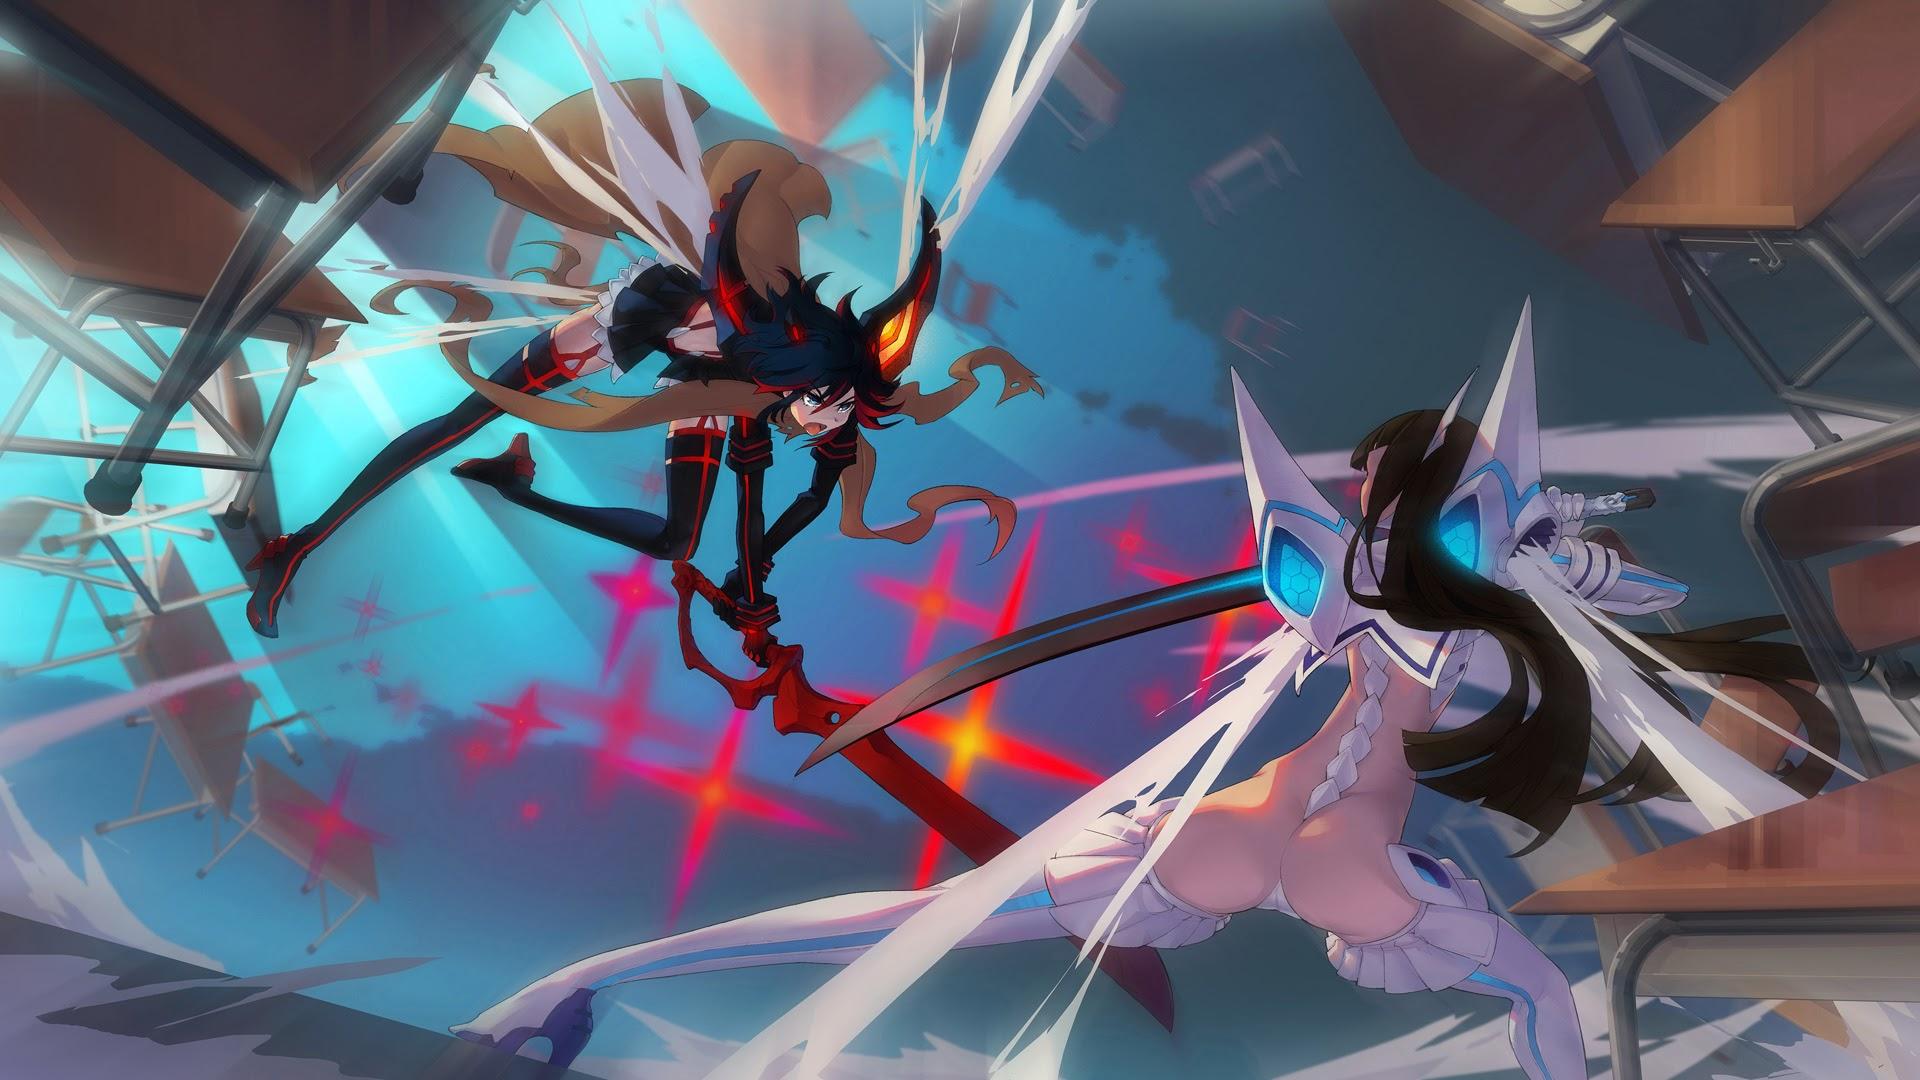 vs kiryuin satsuki kill la kill fighting anime girl image hd wallpaper 1920x1080